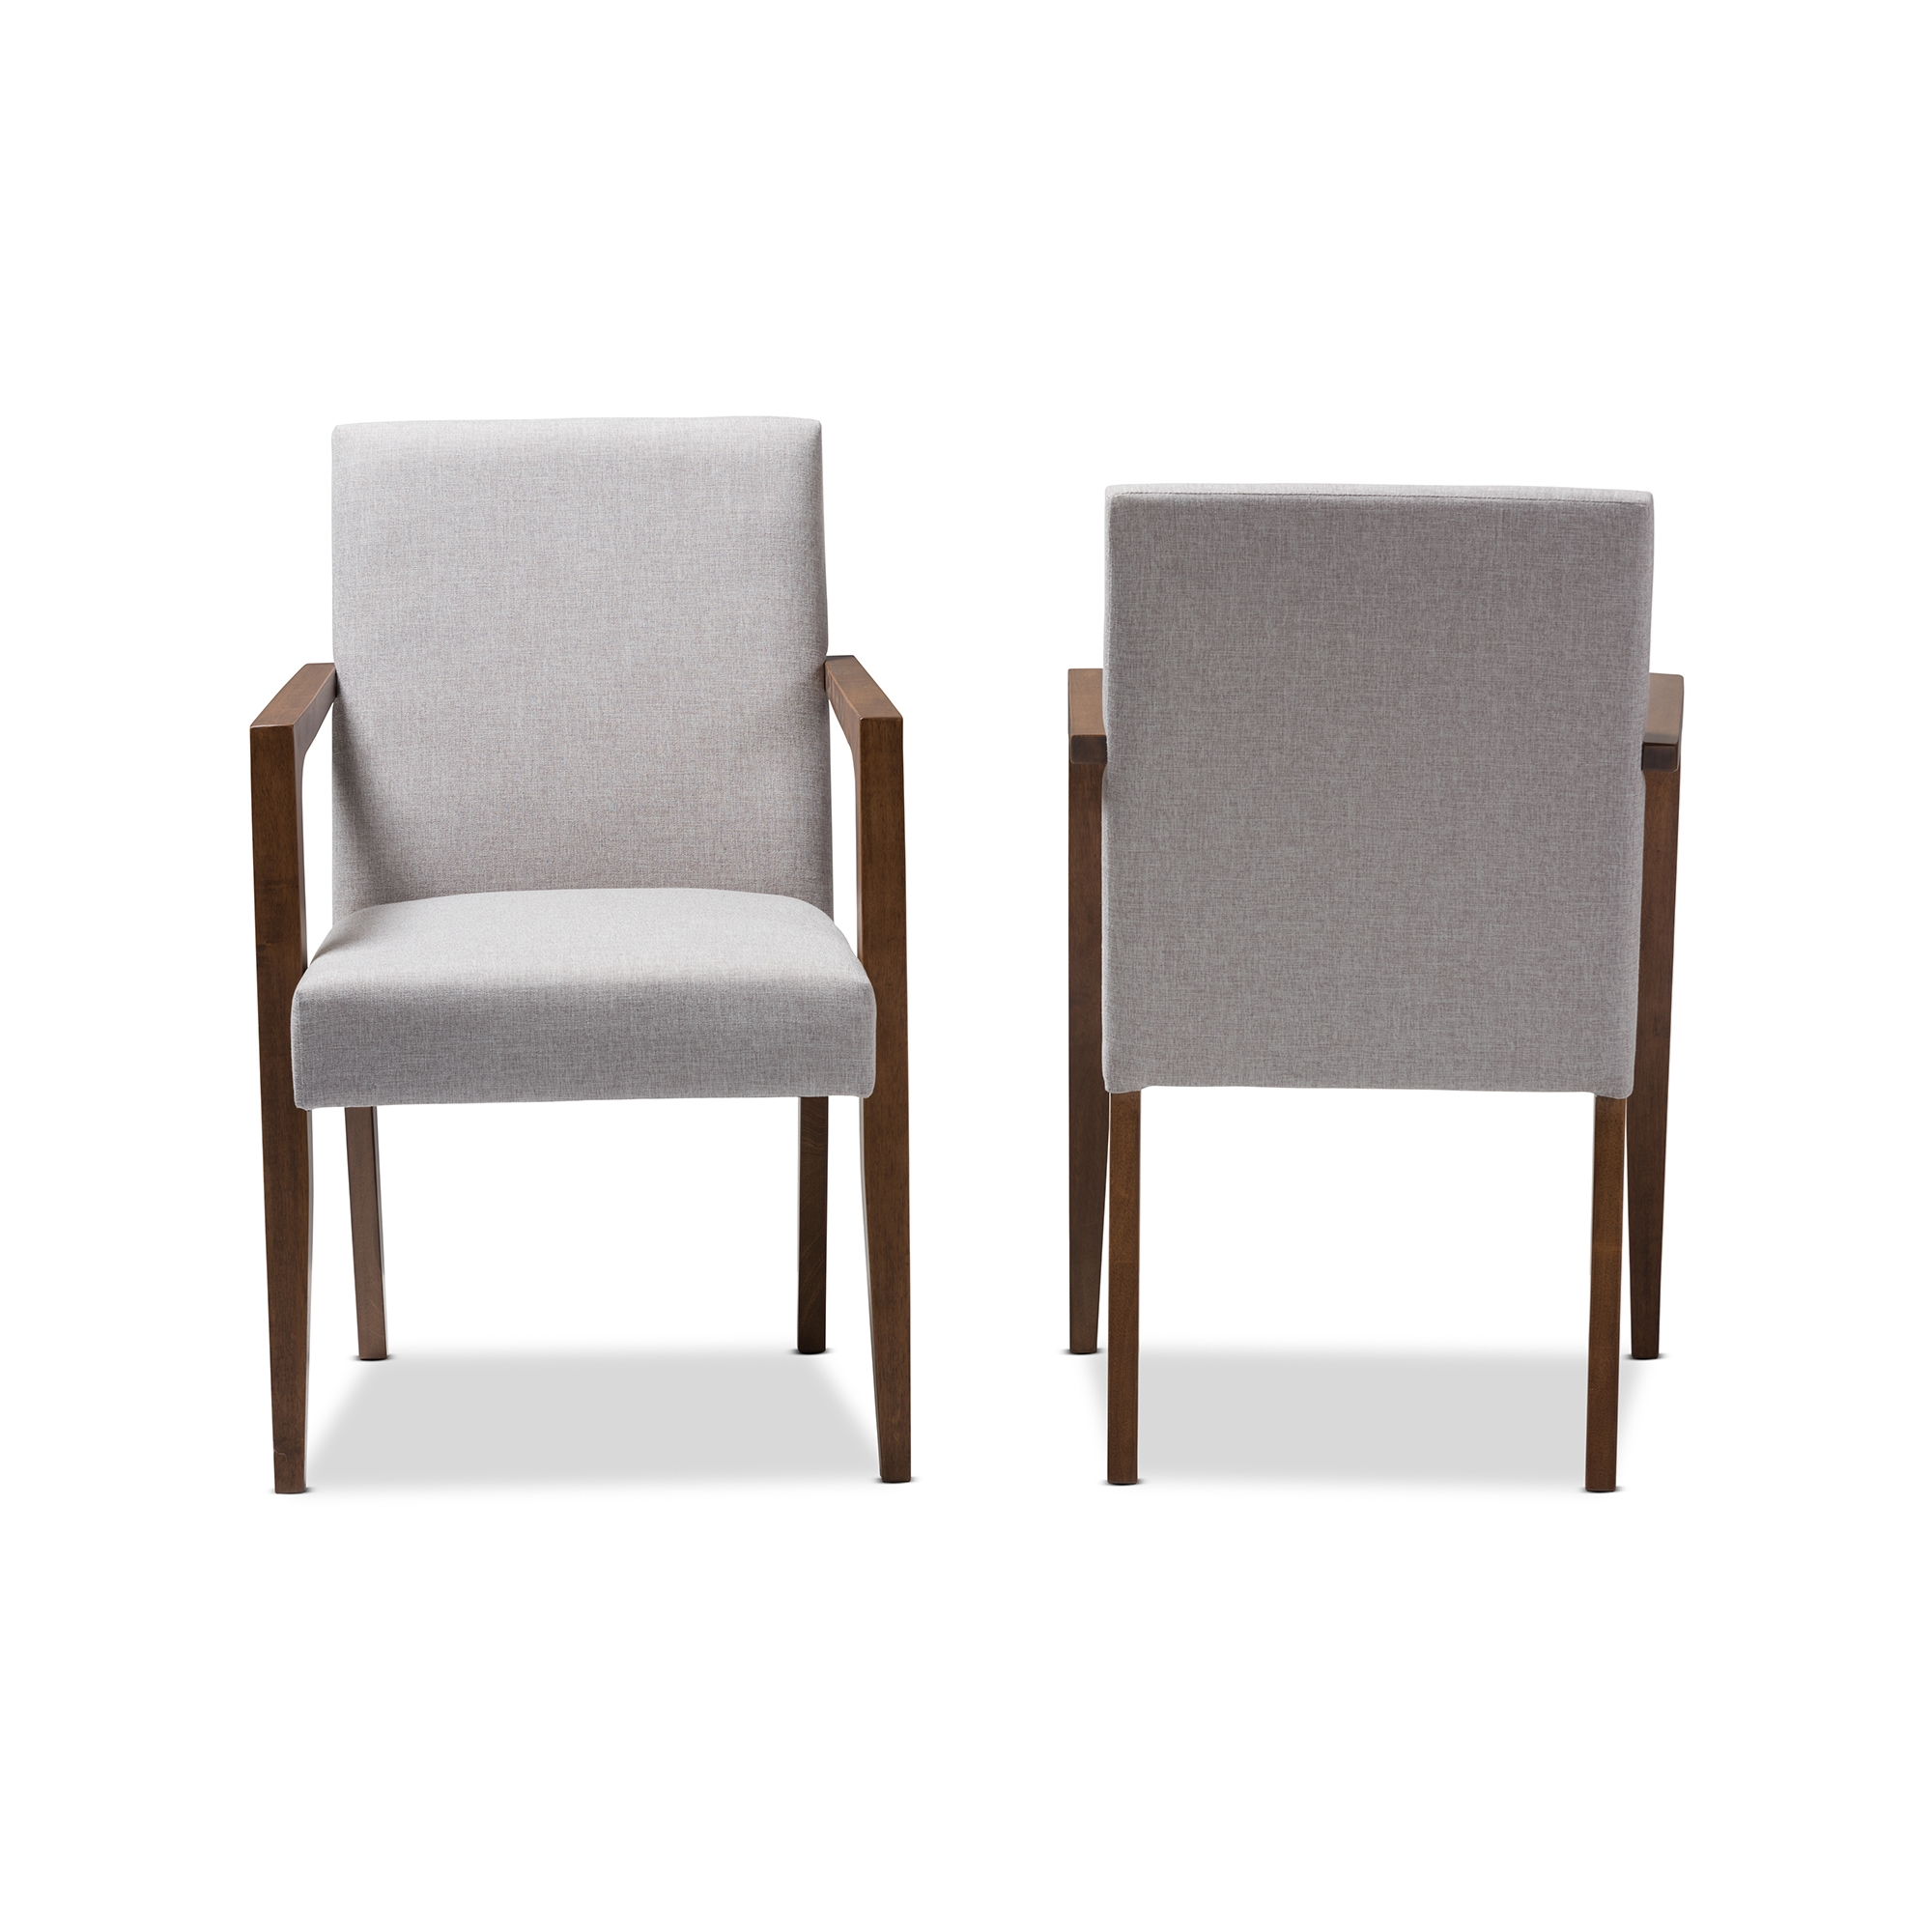 ... Baxton Studio Andrea Mid Century Modern Greyish Beige Upholstered Wooden  Armchair (Set Of 2 ...